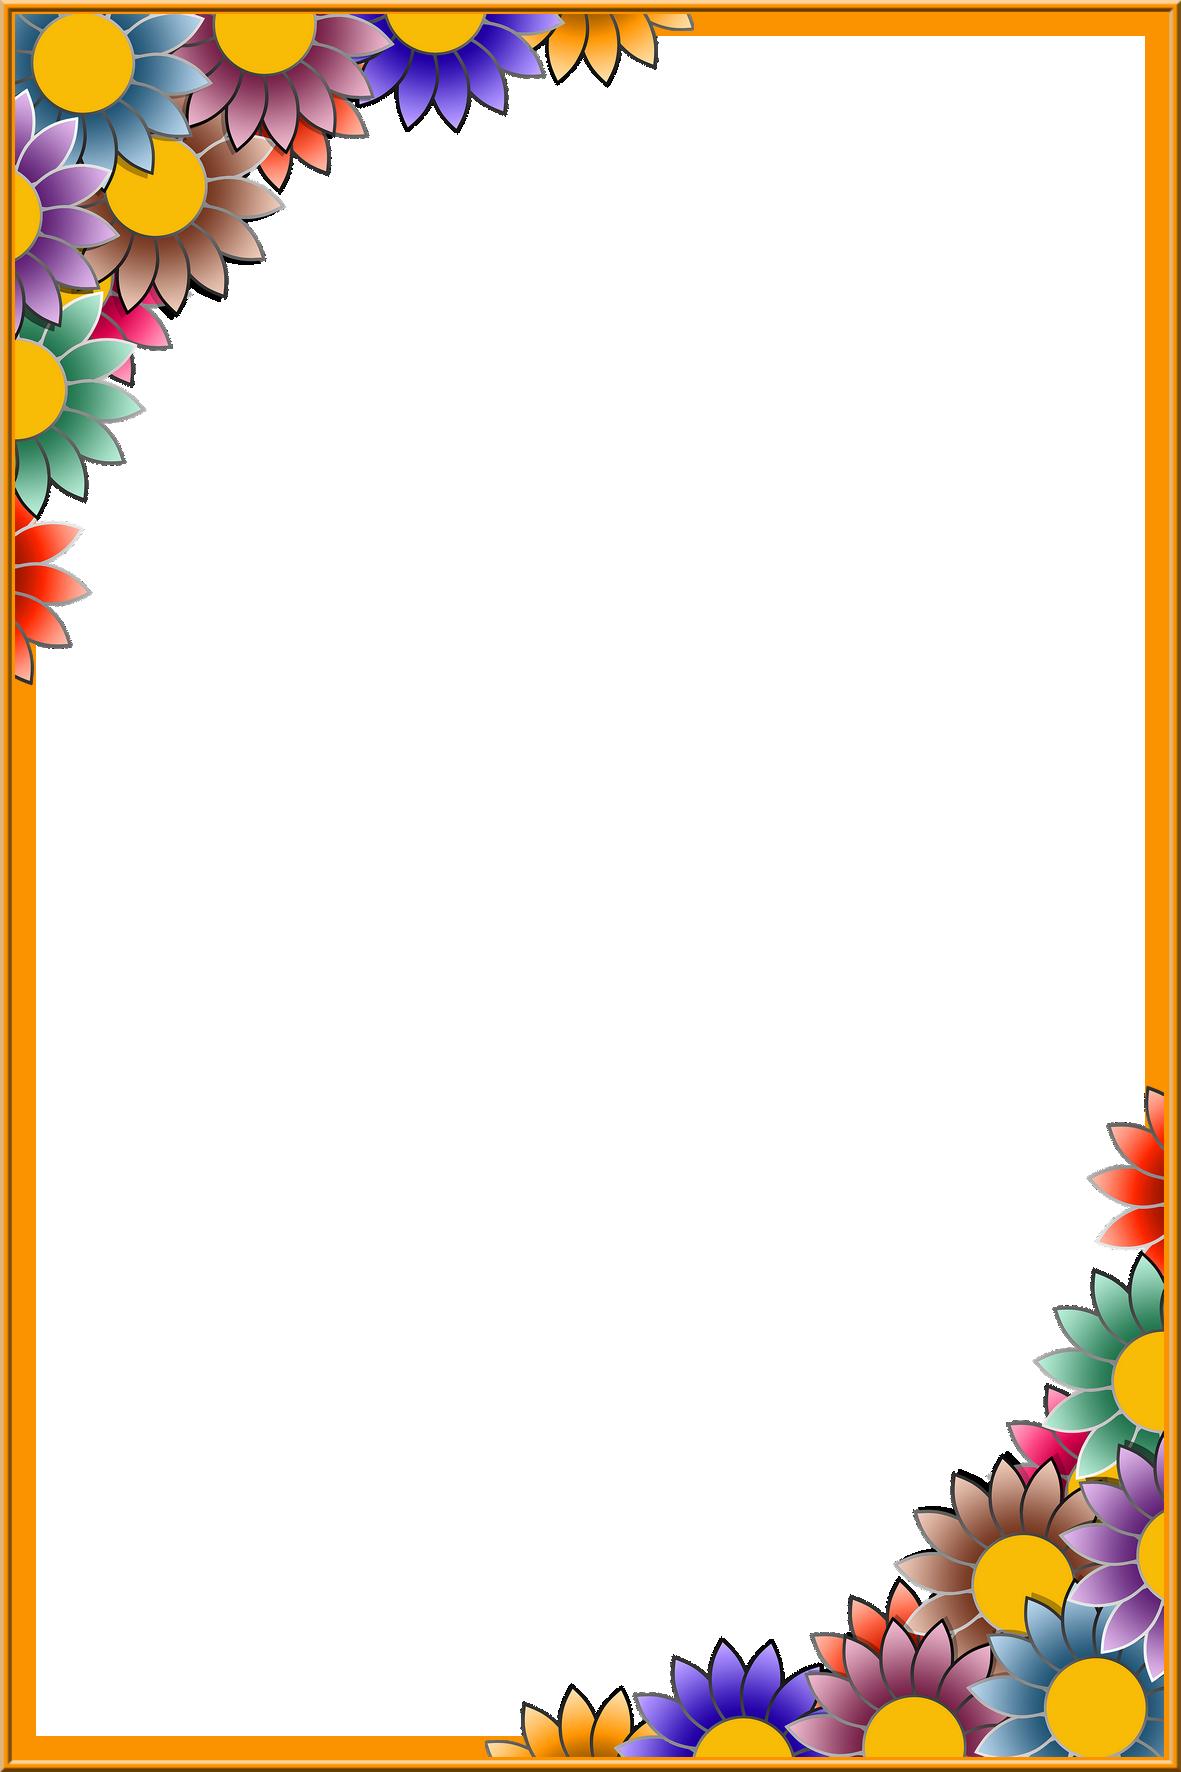 Frame Png Colorful Borders Design Page Borders Design Boarder Designs